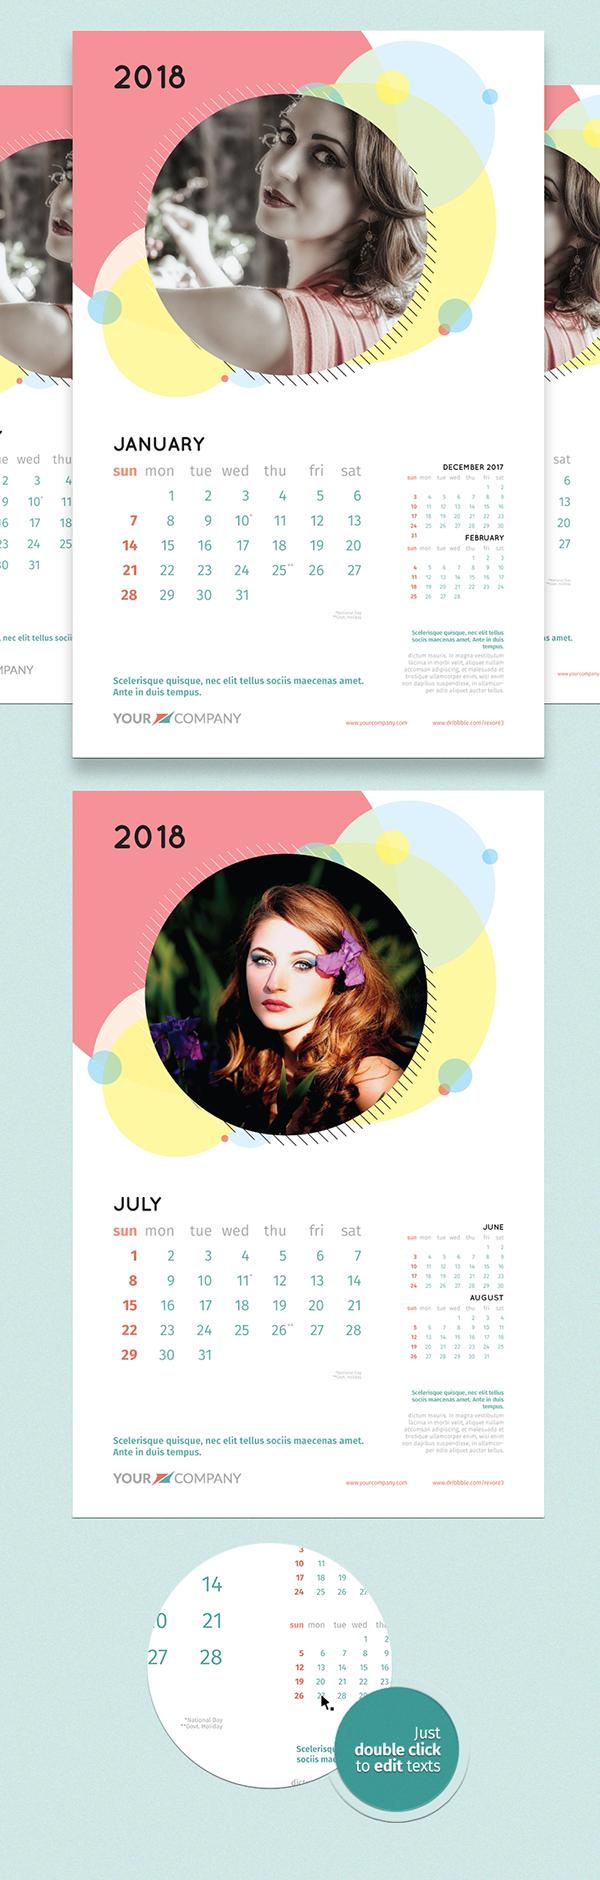 wall calendar 2018 template on behance. Black Bedroom Furniture Sets. Home Design Ideas